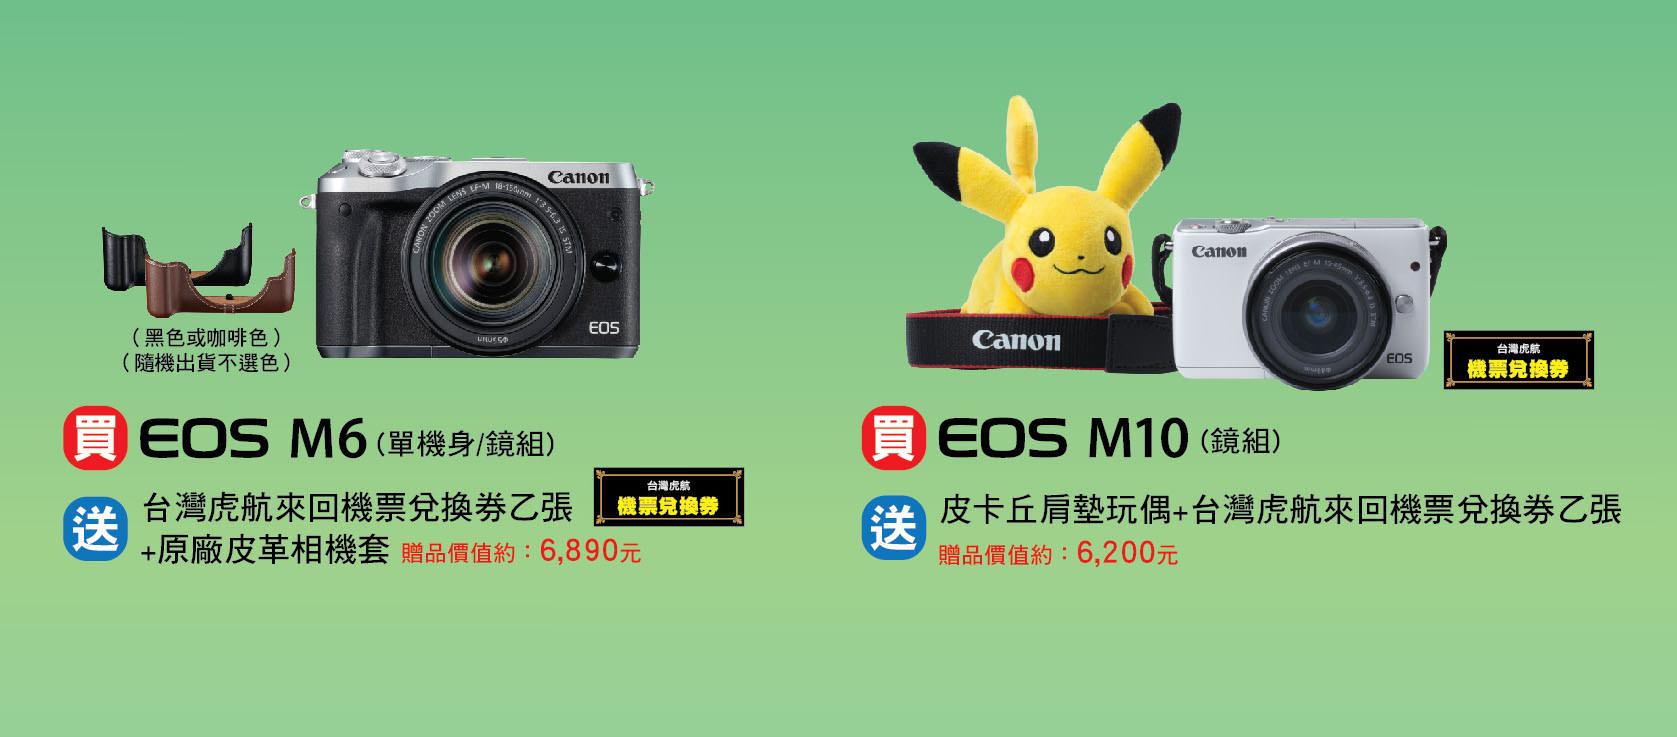 【3C】Canon EOS M10迷你單眼 超好拍 ♥ 輕巧攜帶紀錄美好時刻 - 高妹。Simple Life Wonderland